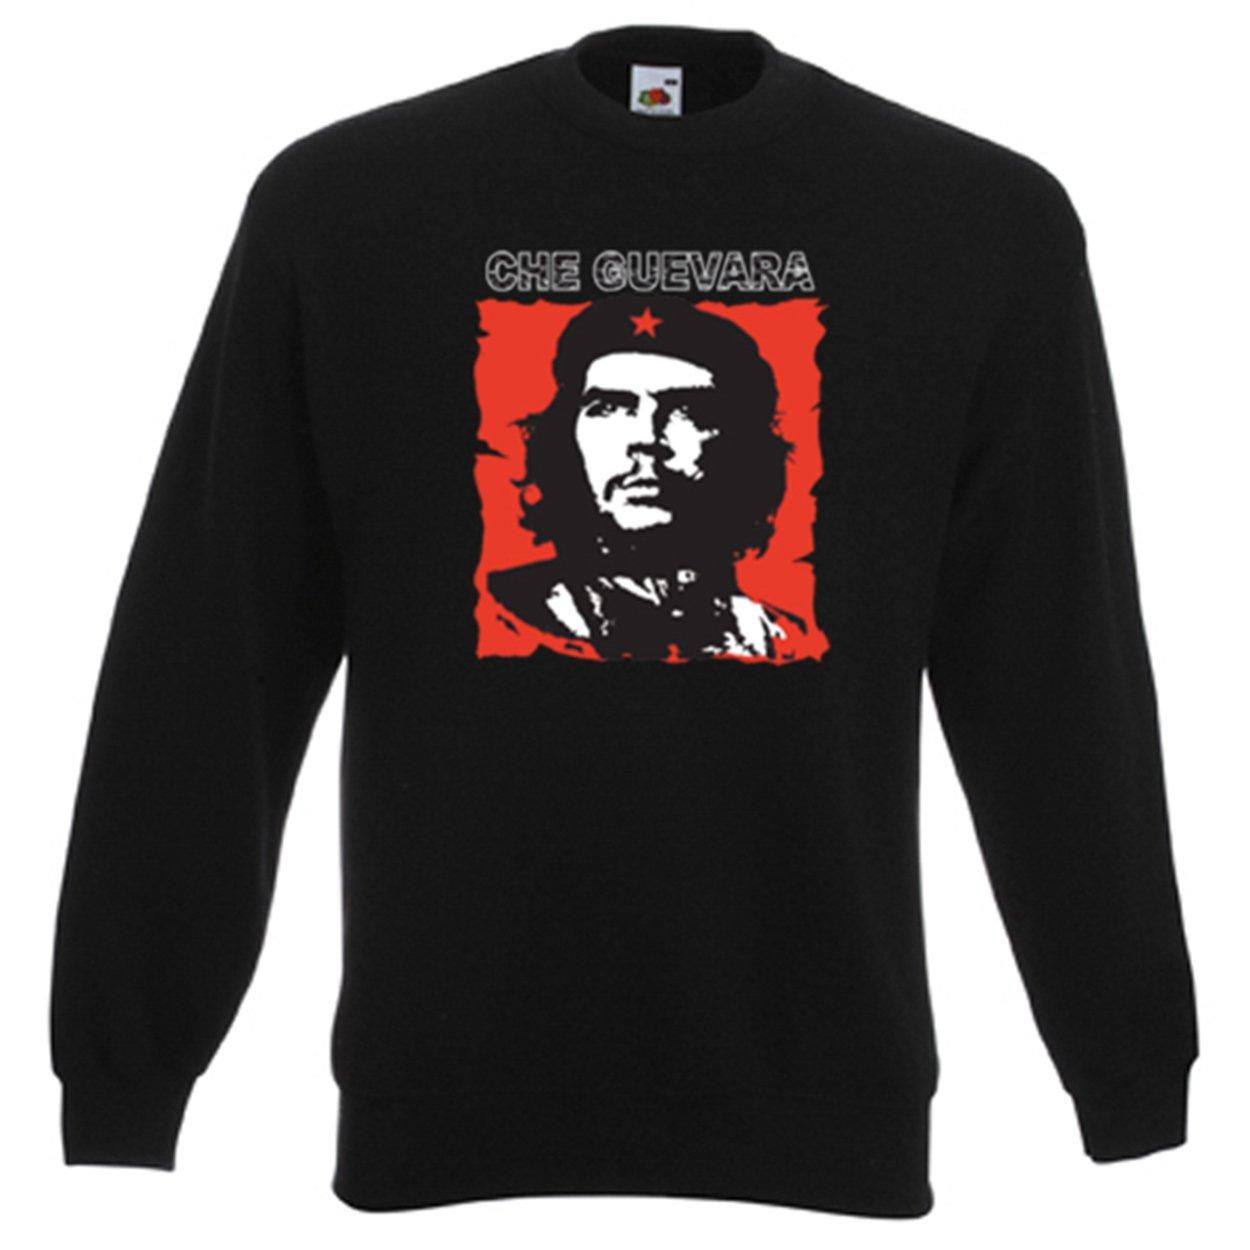 Che Guevara Sweatshirt: Che Guevara